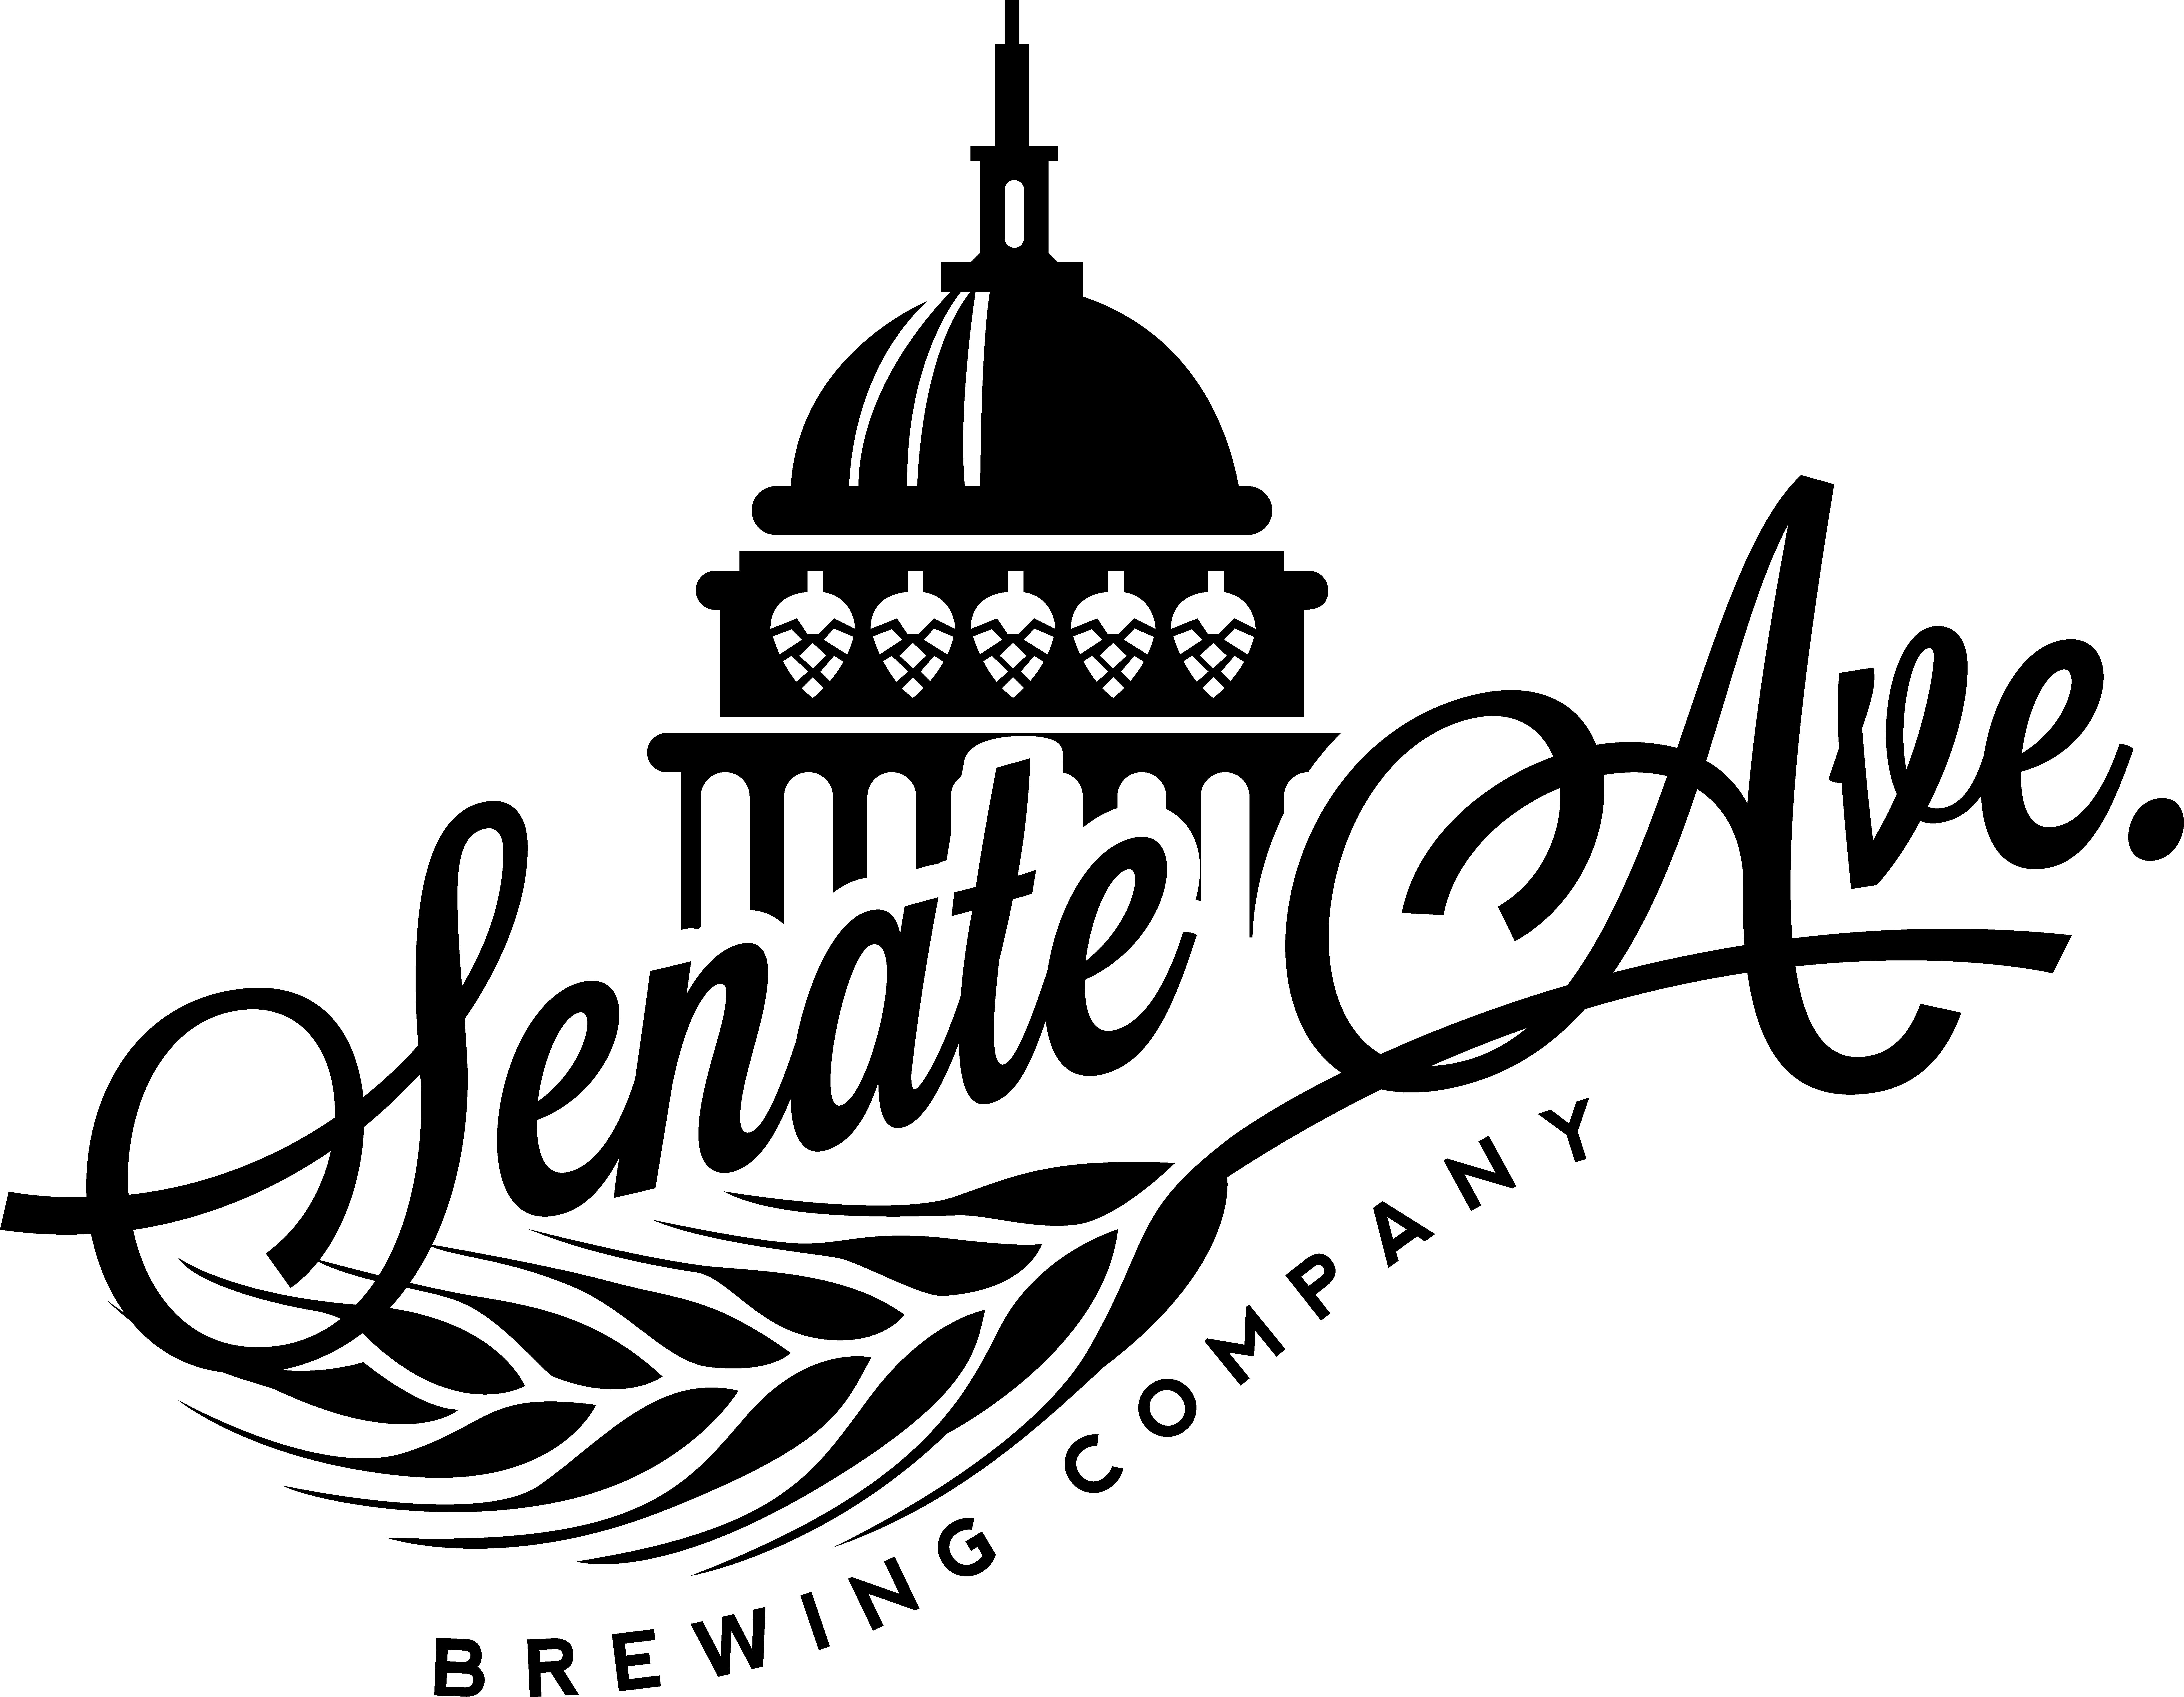 senate avenue logo